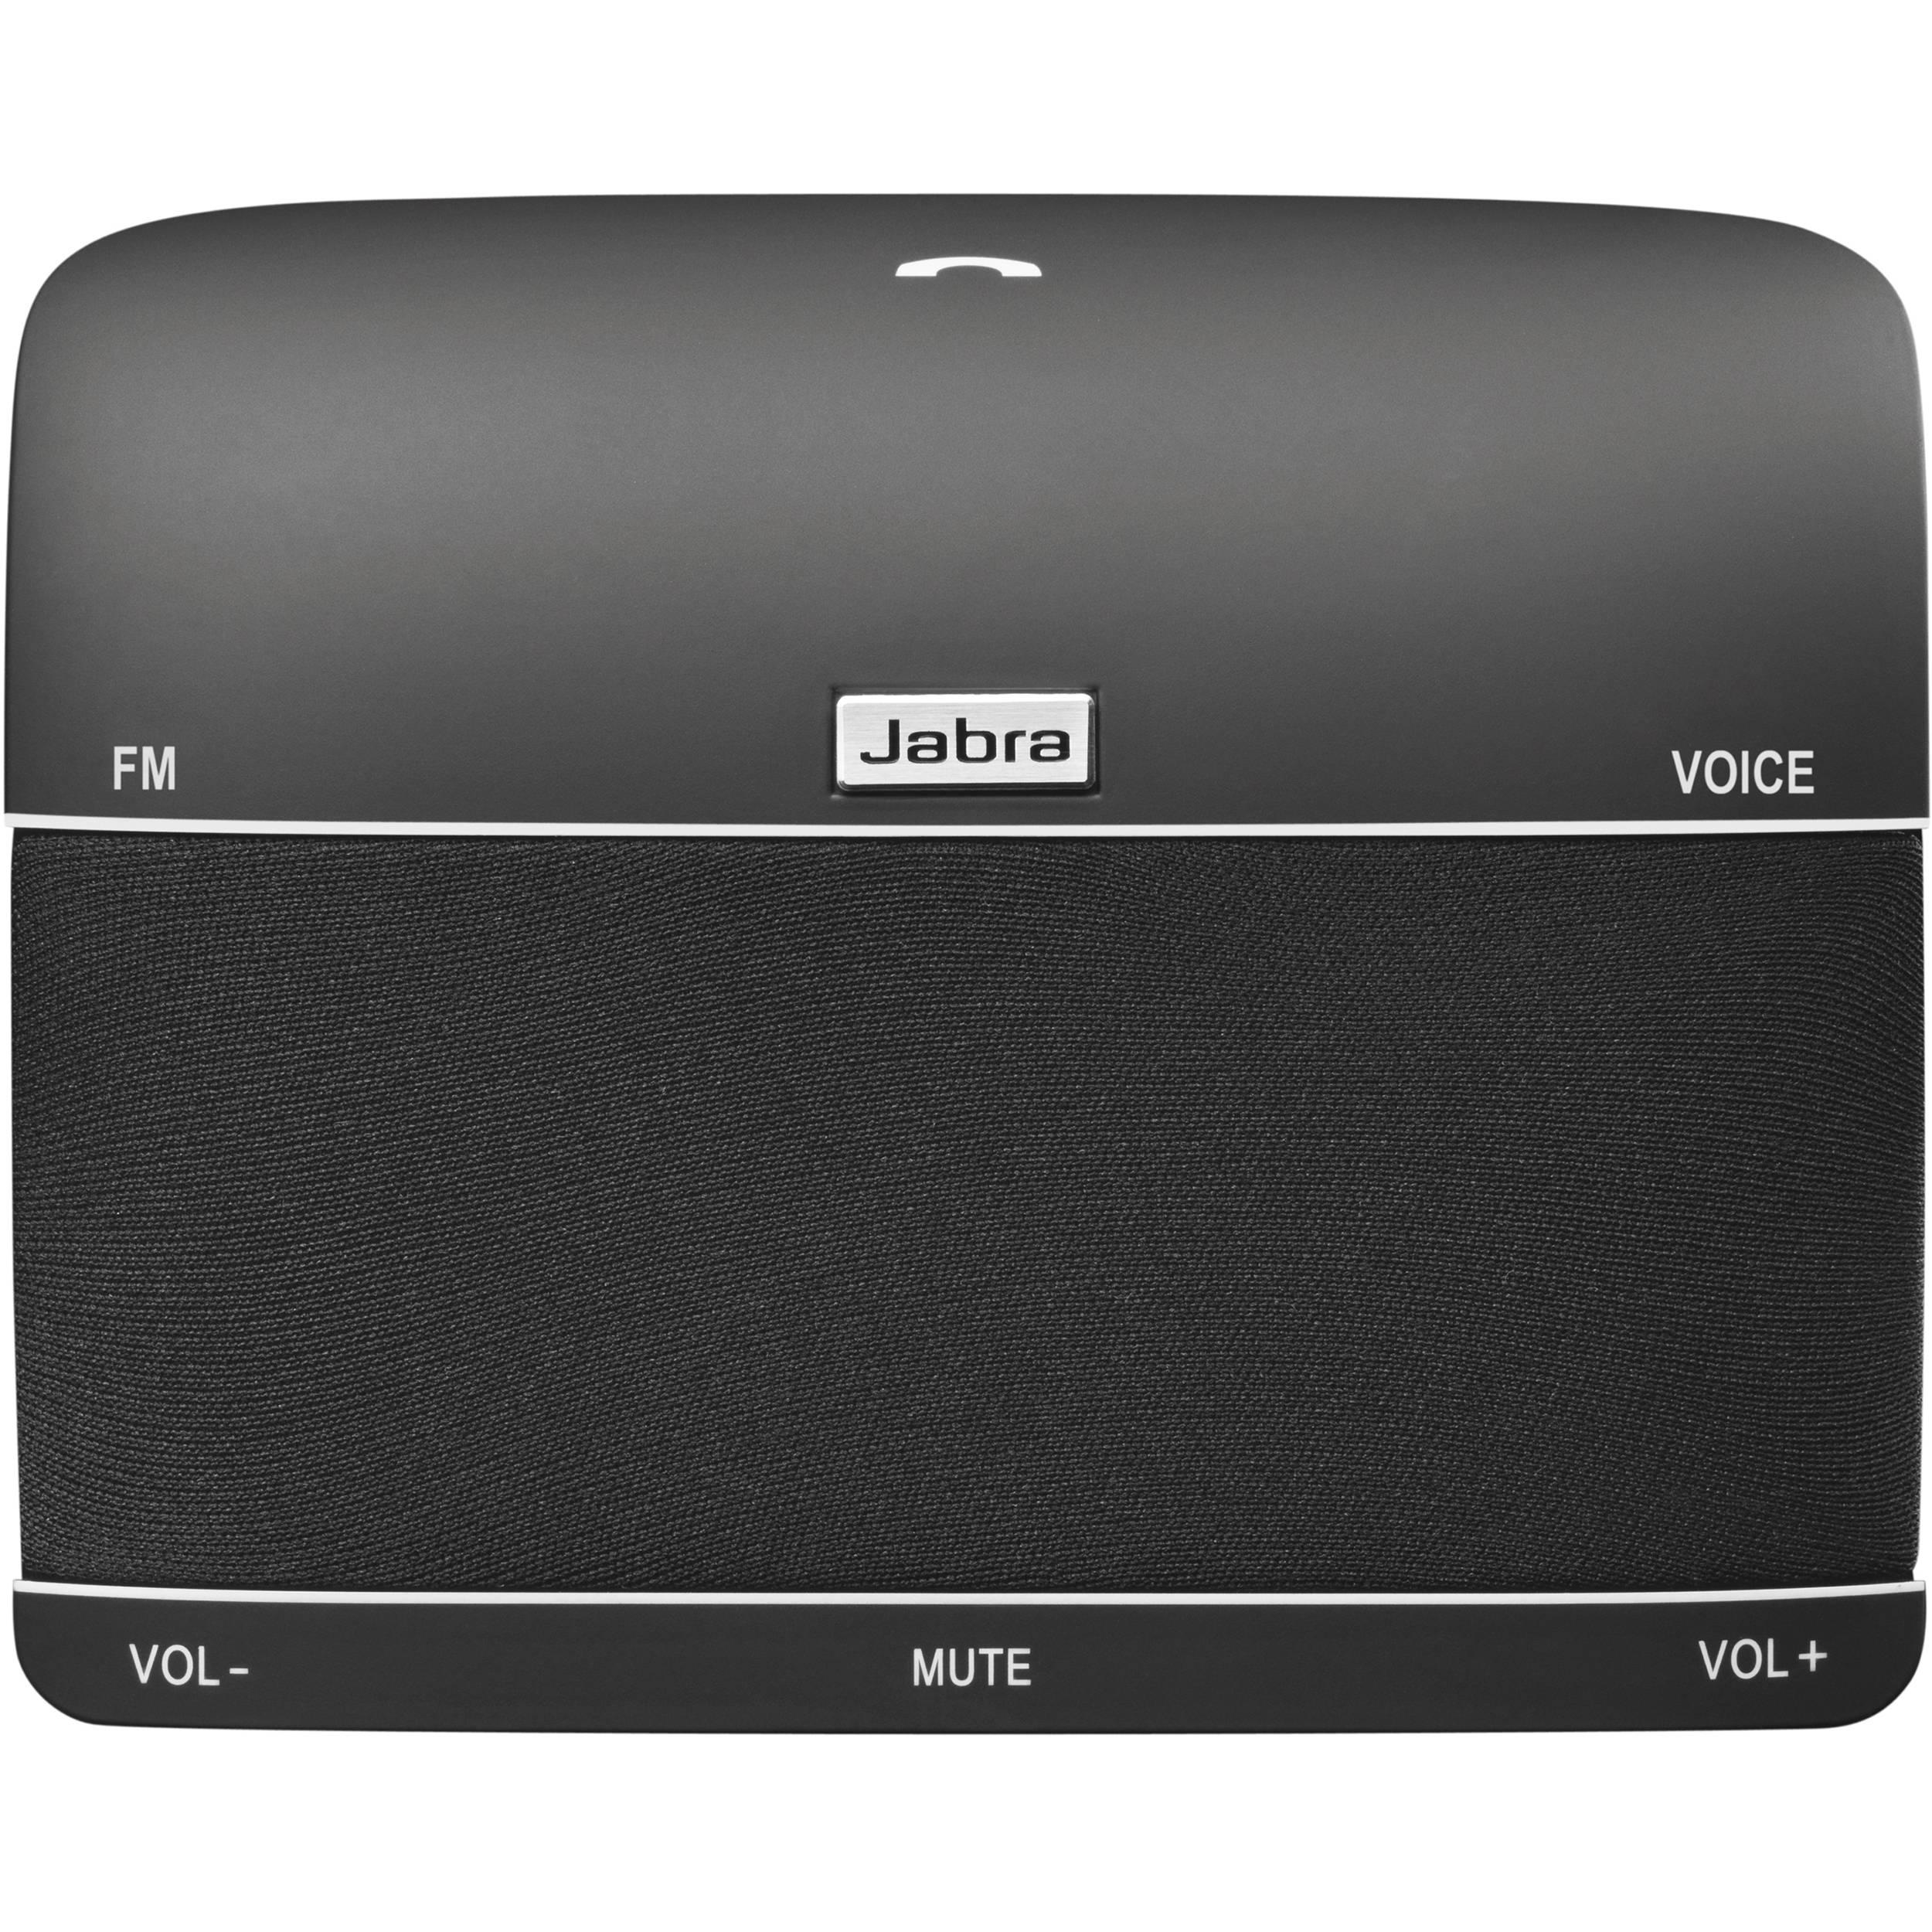 Rbt Technology Unveils Jabra Motion Nfc Supporting: Jabra Freeway Bluetooth Speakerphone 100-46000000-02 B&H Photo